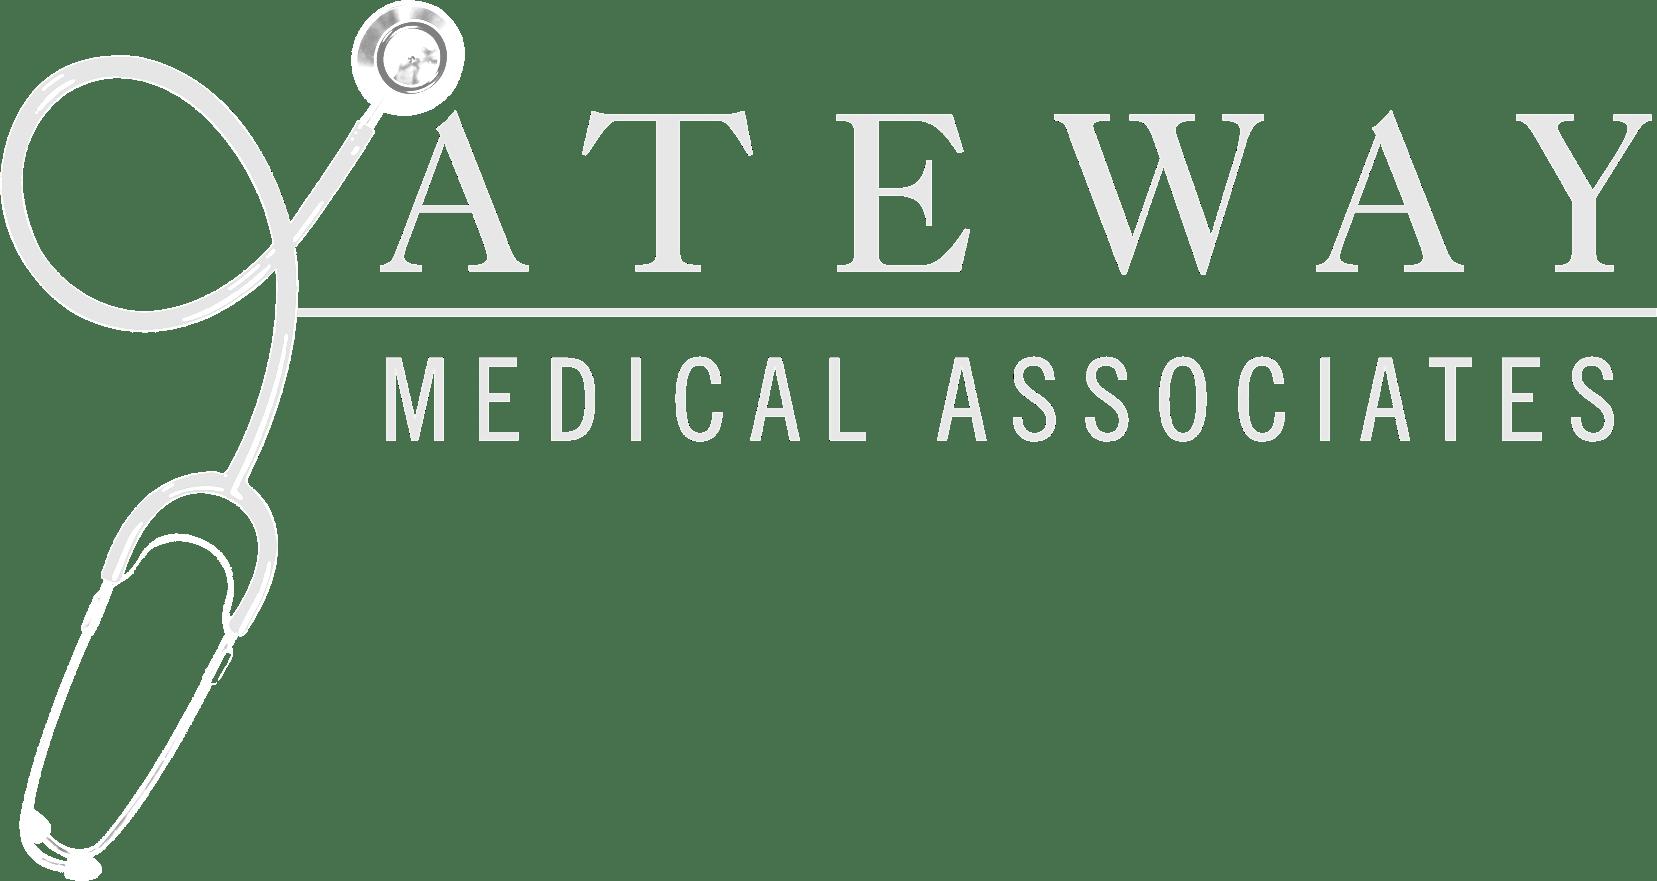 Gateway Medical Associates company logo